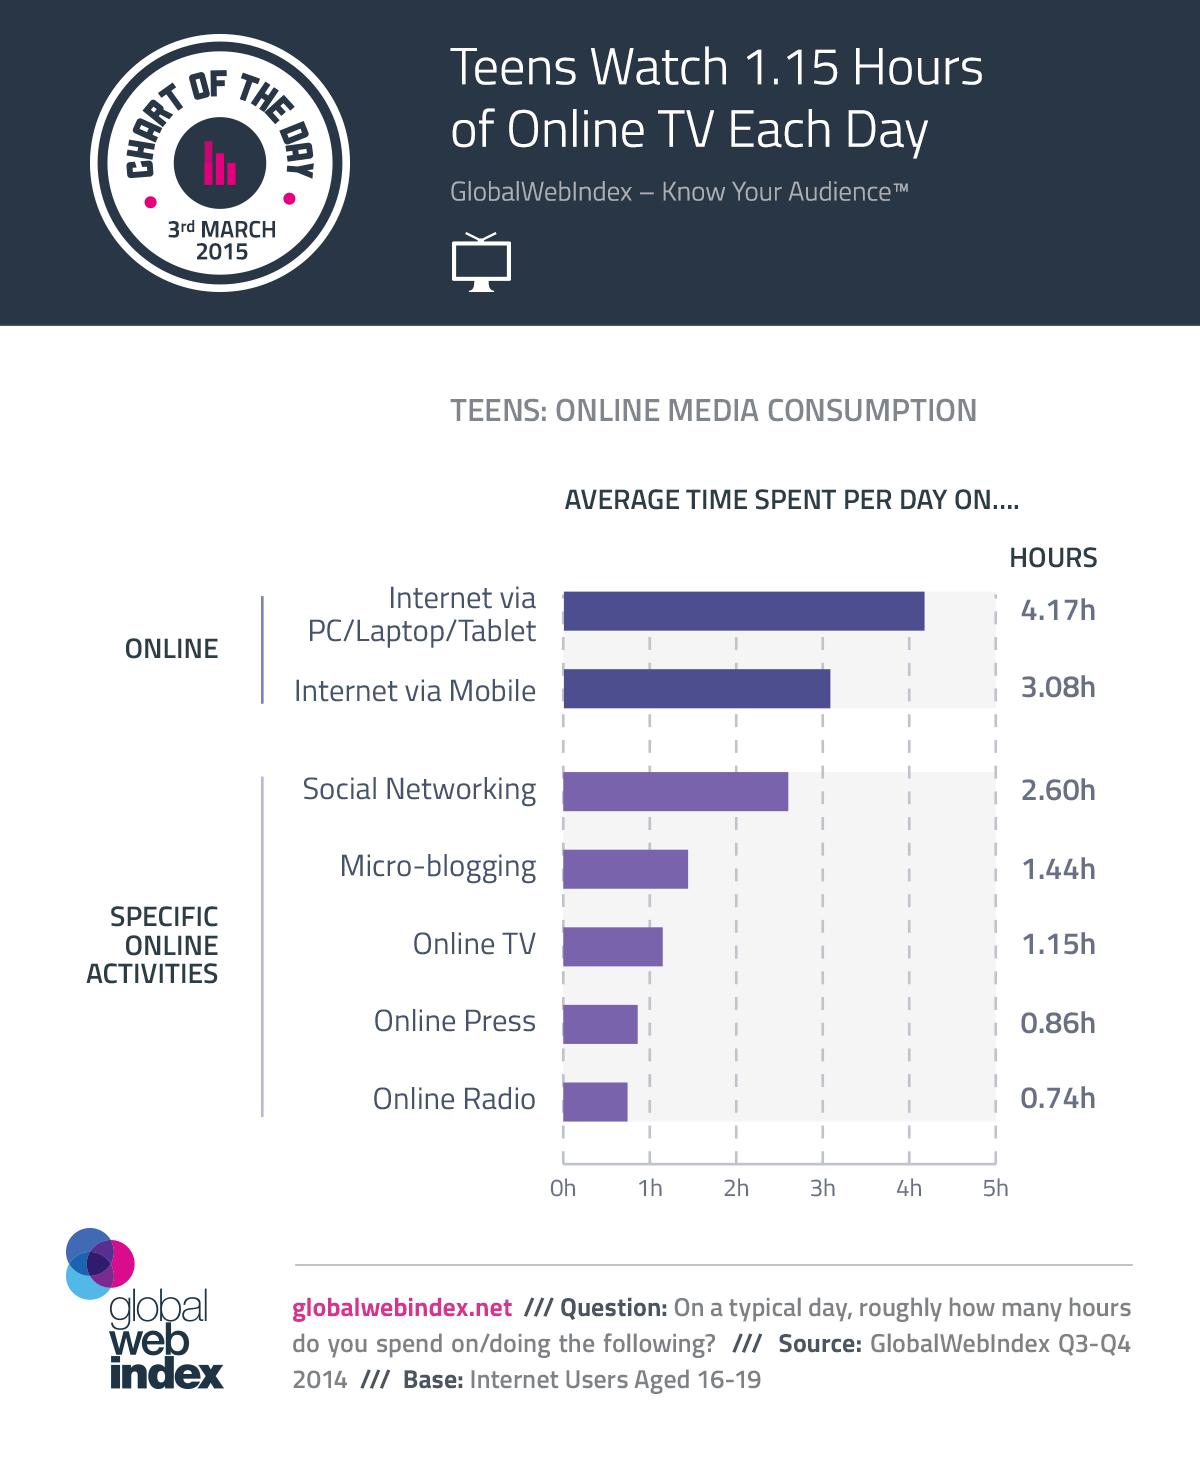 3rd-Feb-2015-Teens-Watch-1.15-Hours-of-Online-TV-Each-Day